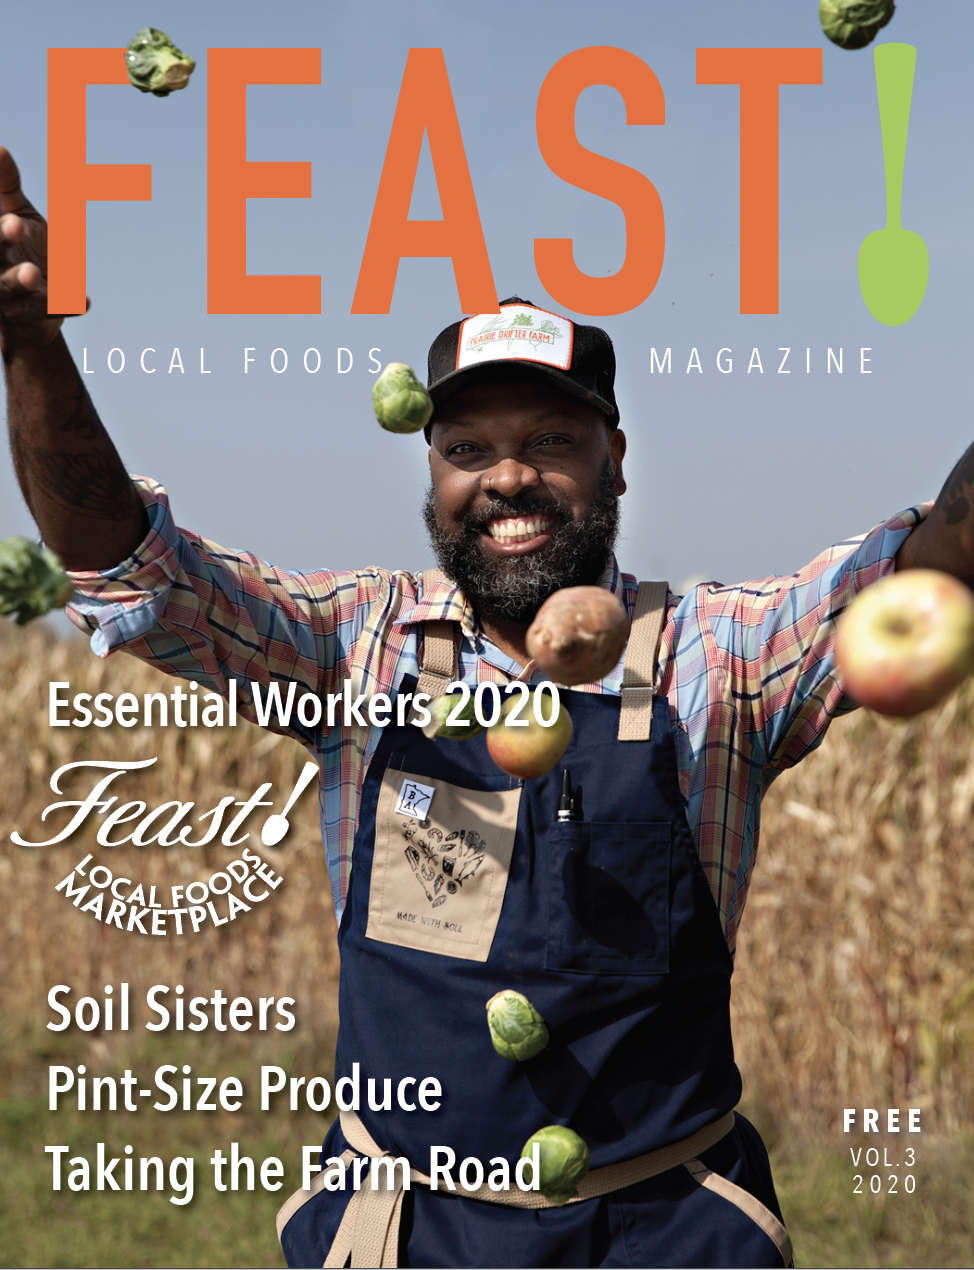 FEAST ! Local Foods Magazine Volume 3 cover